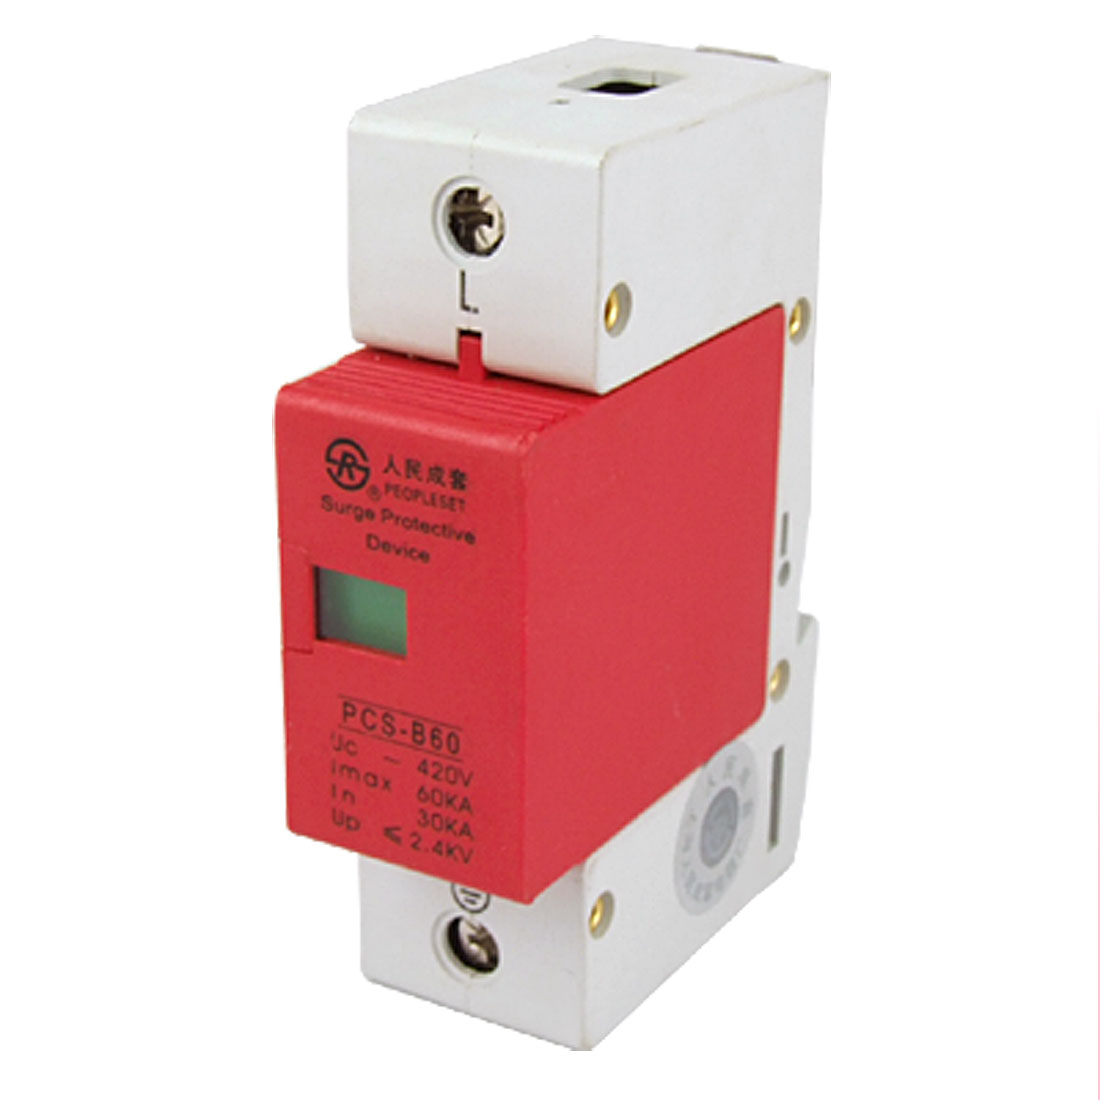 Power Security Single Phase Surge Arrester 60KA 420VAC